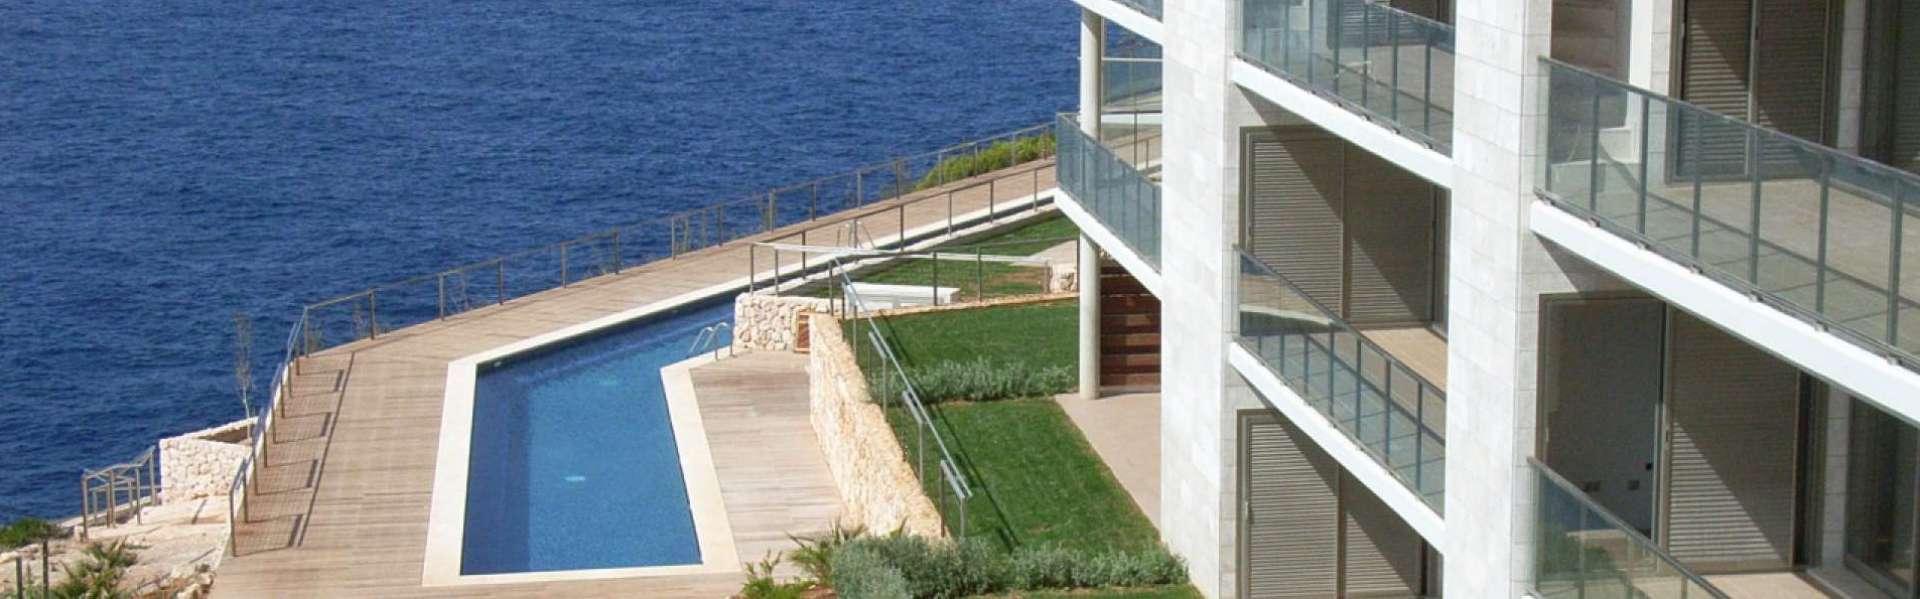 Santanyi / Cala Figuera - Meerblickapartment zum Kauf